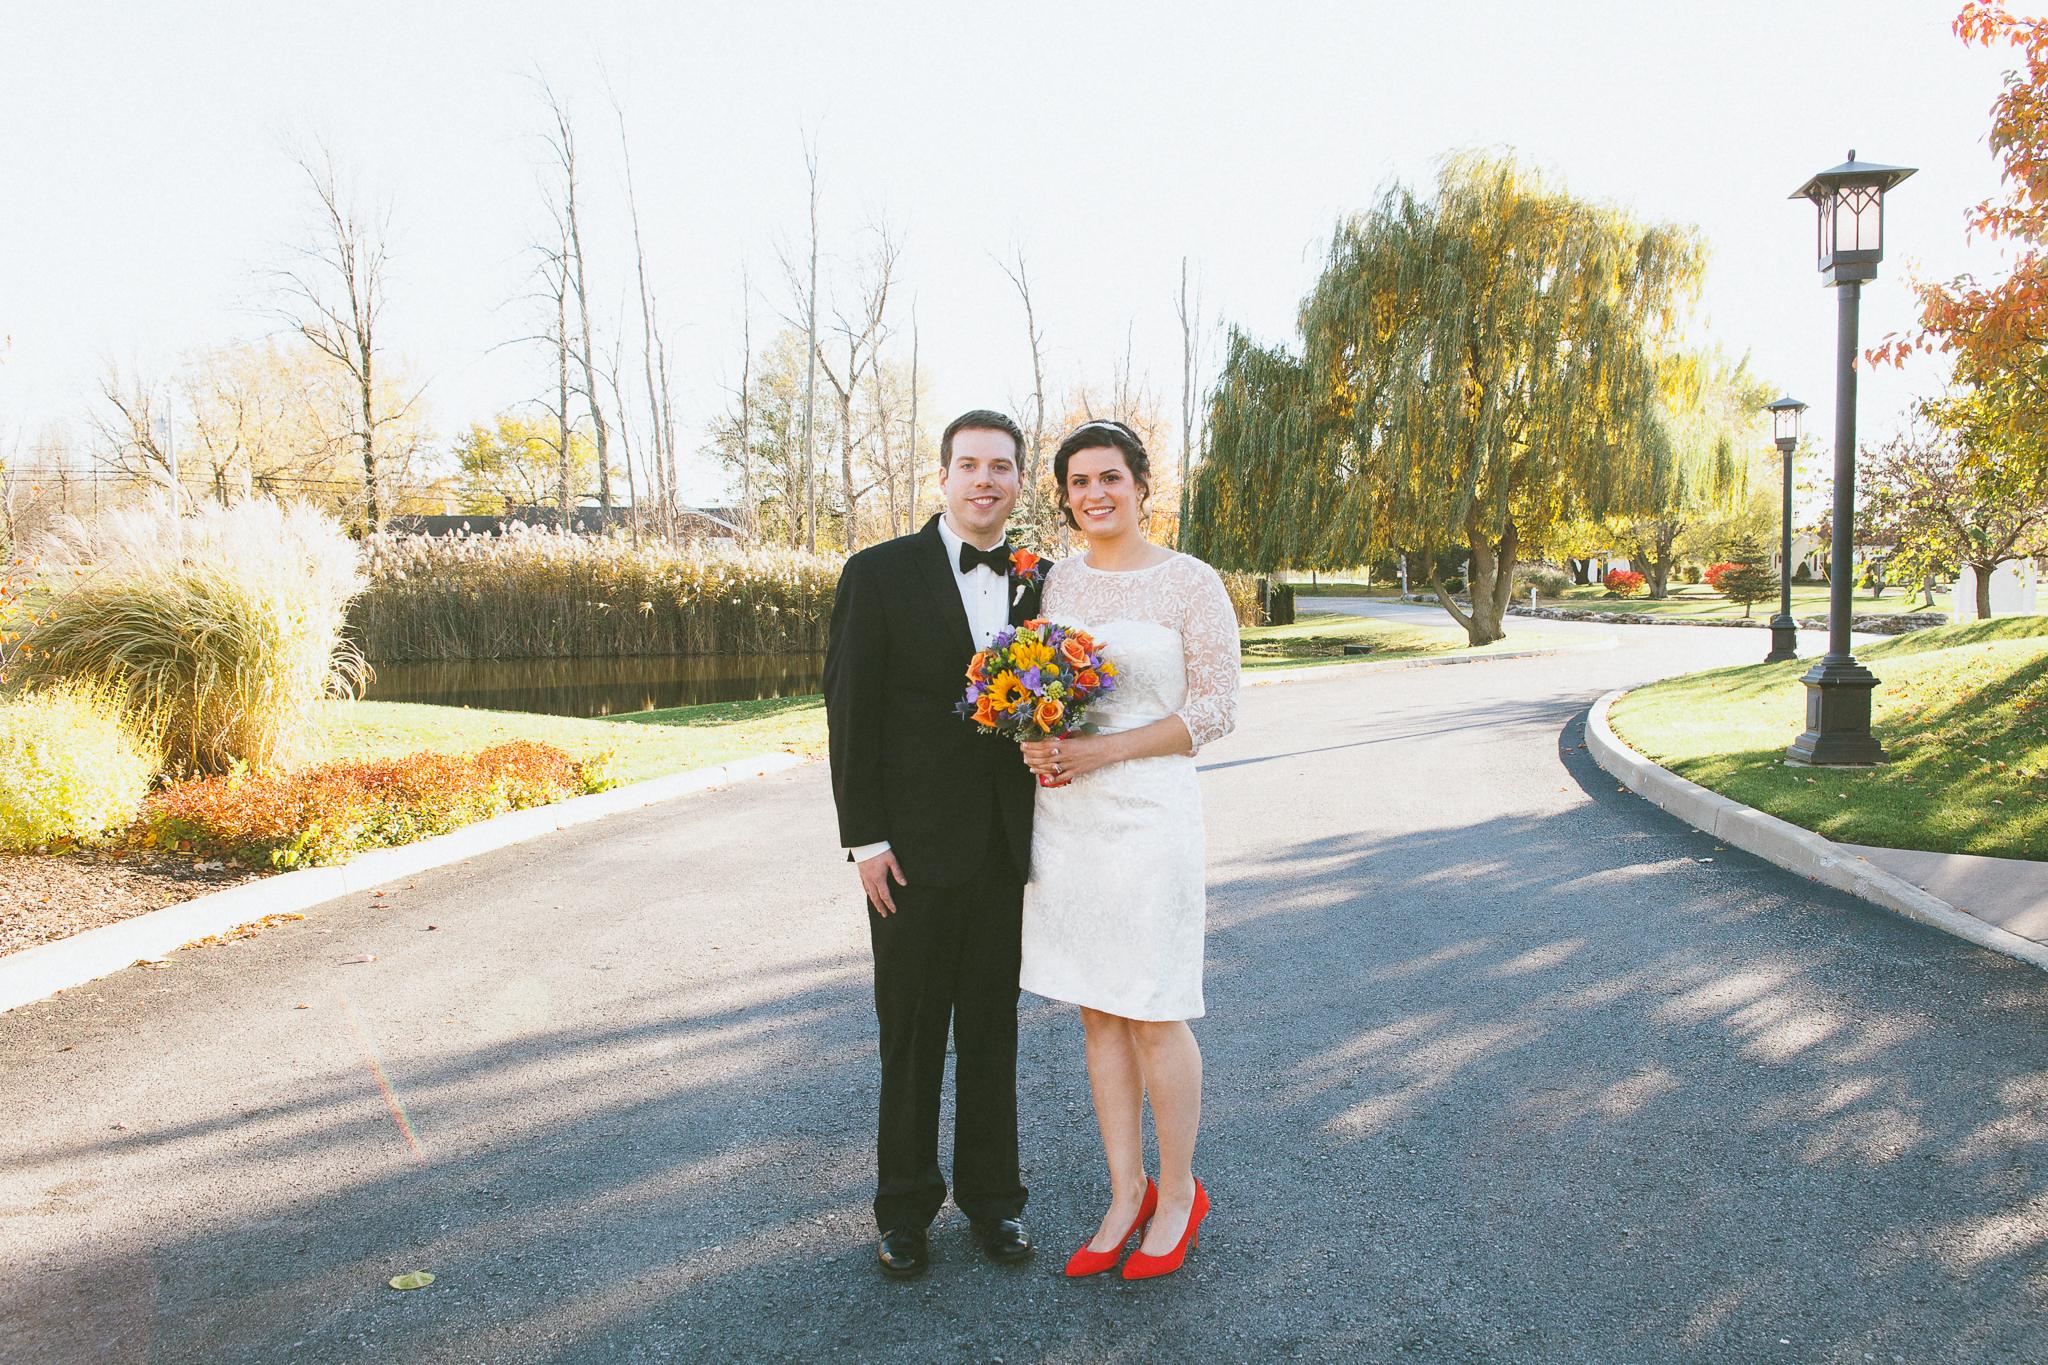 camuglia-whomstudio-chelsea_and_andy-nycphotographer-wedding-brooklyn-buffalo-timberlodge-025-0102.jpg